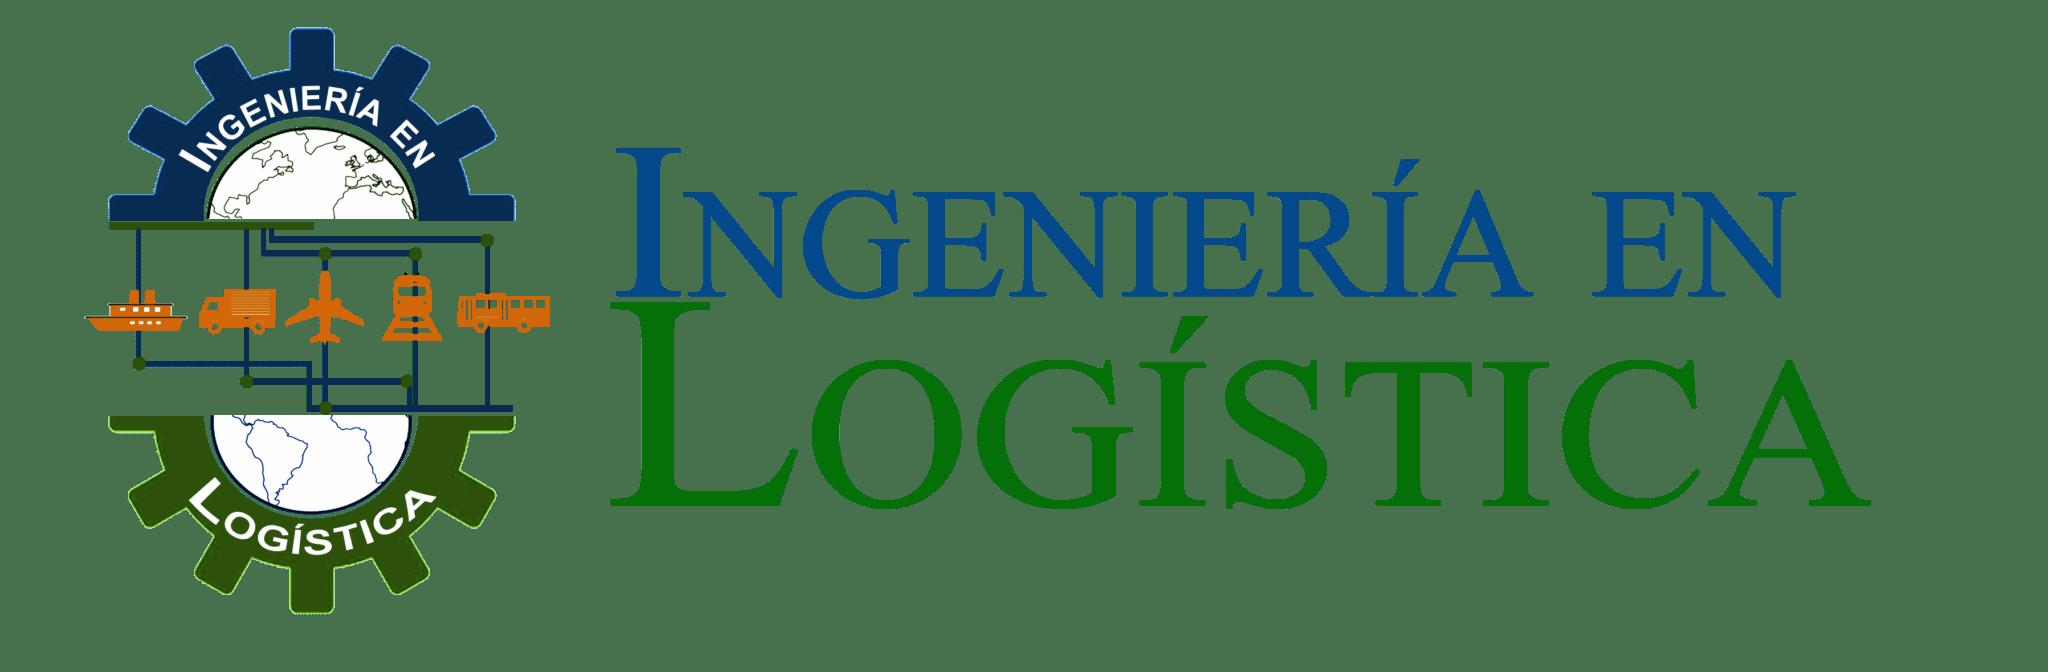 LOGISTICA_HEADING